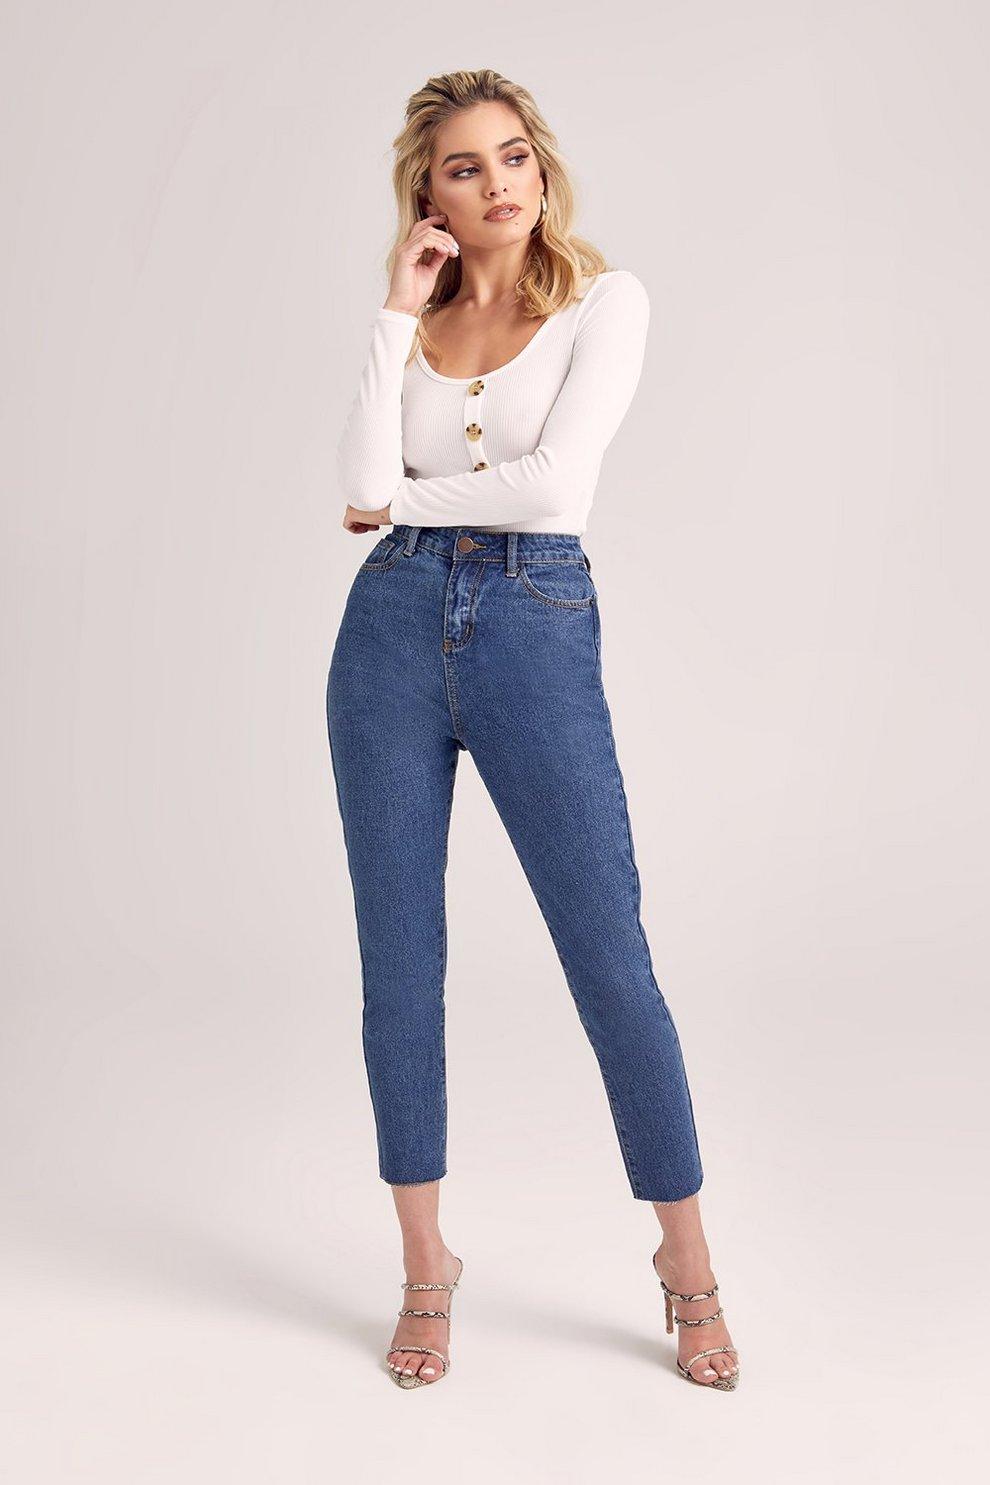 dae3f79216 Petite Straight Leg Frayed Hem Jeans